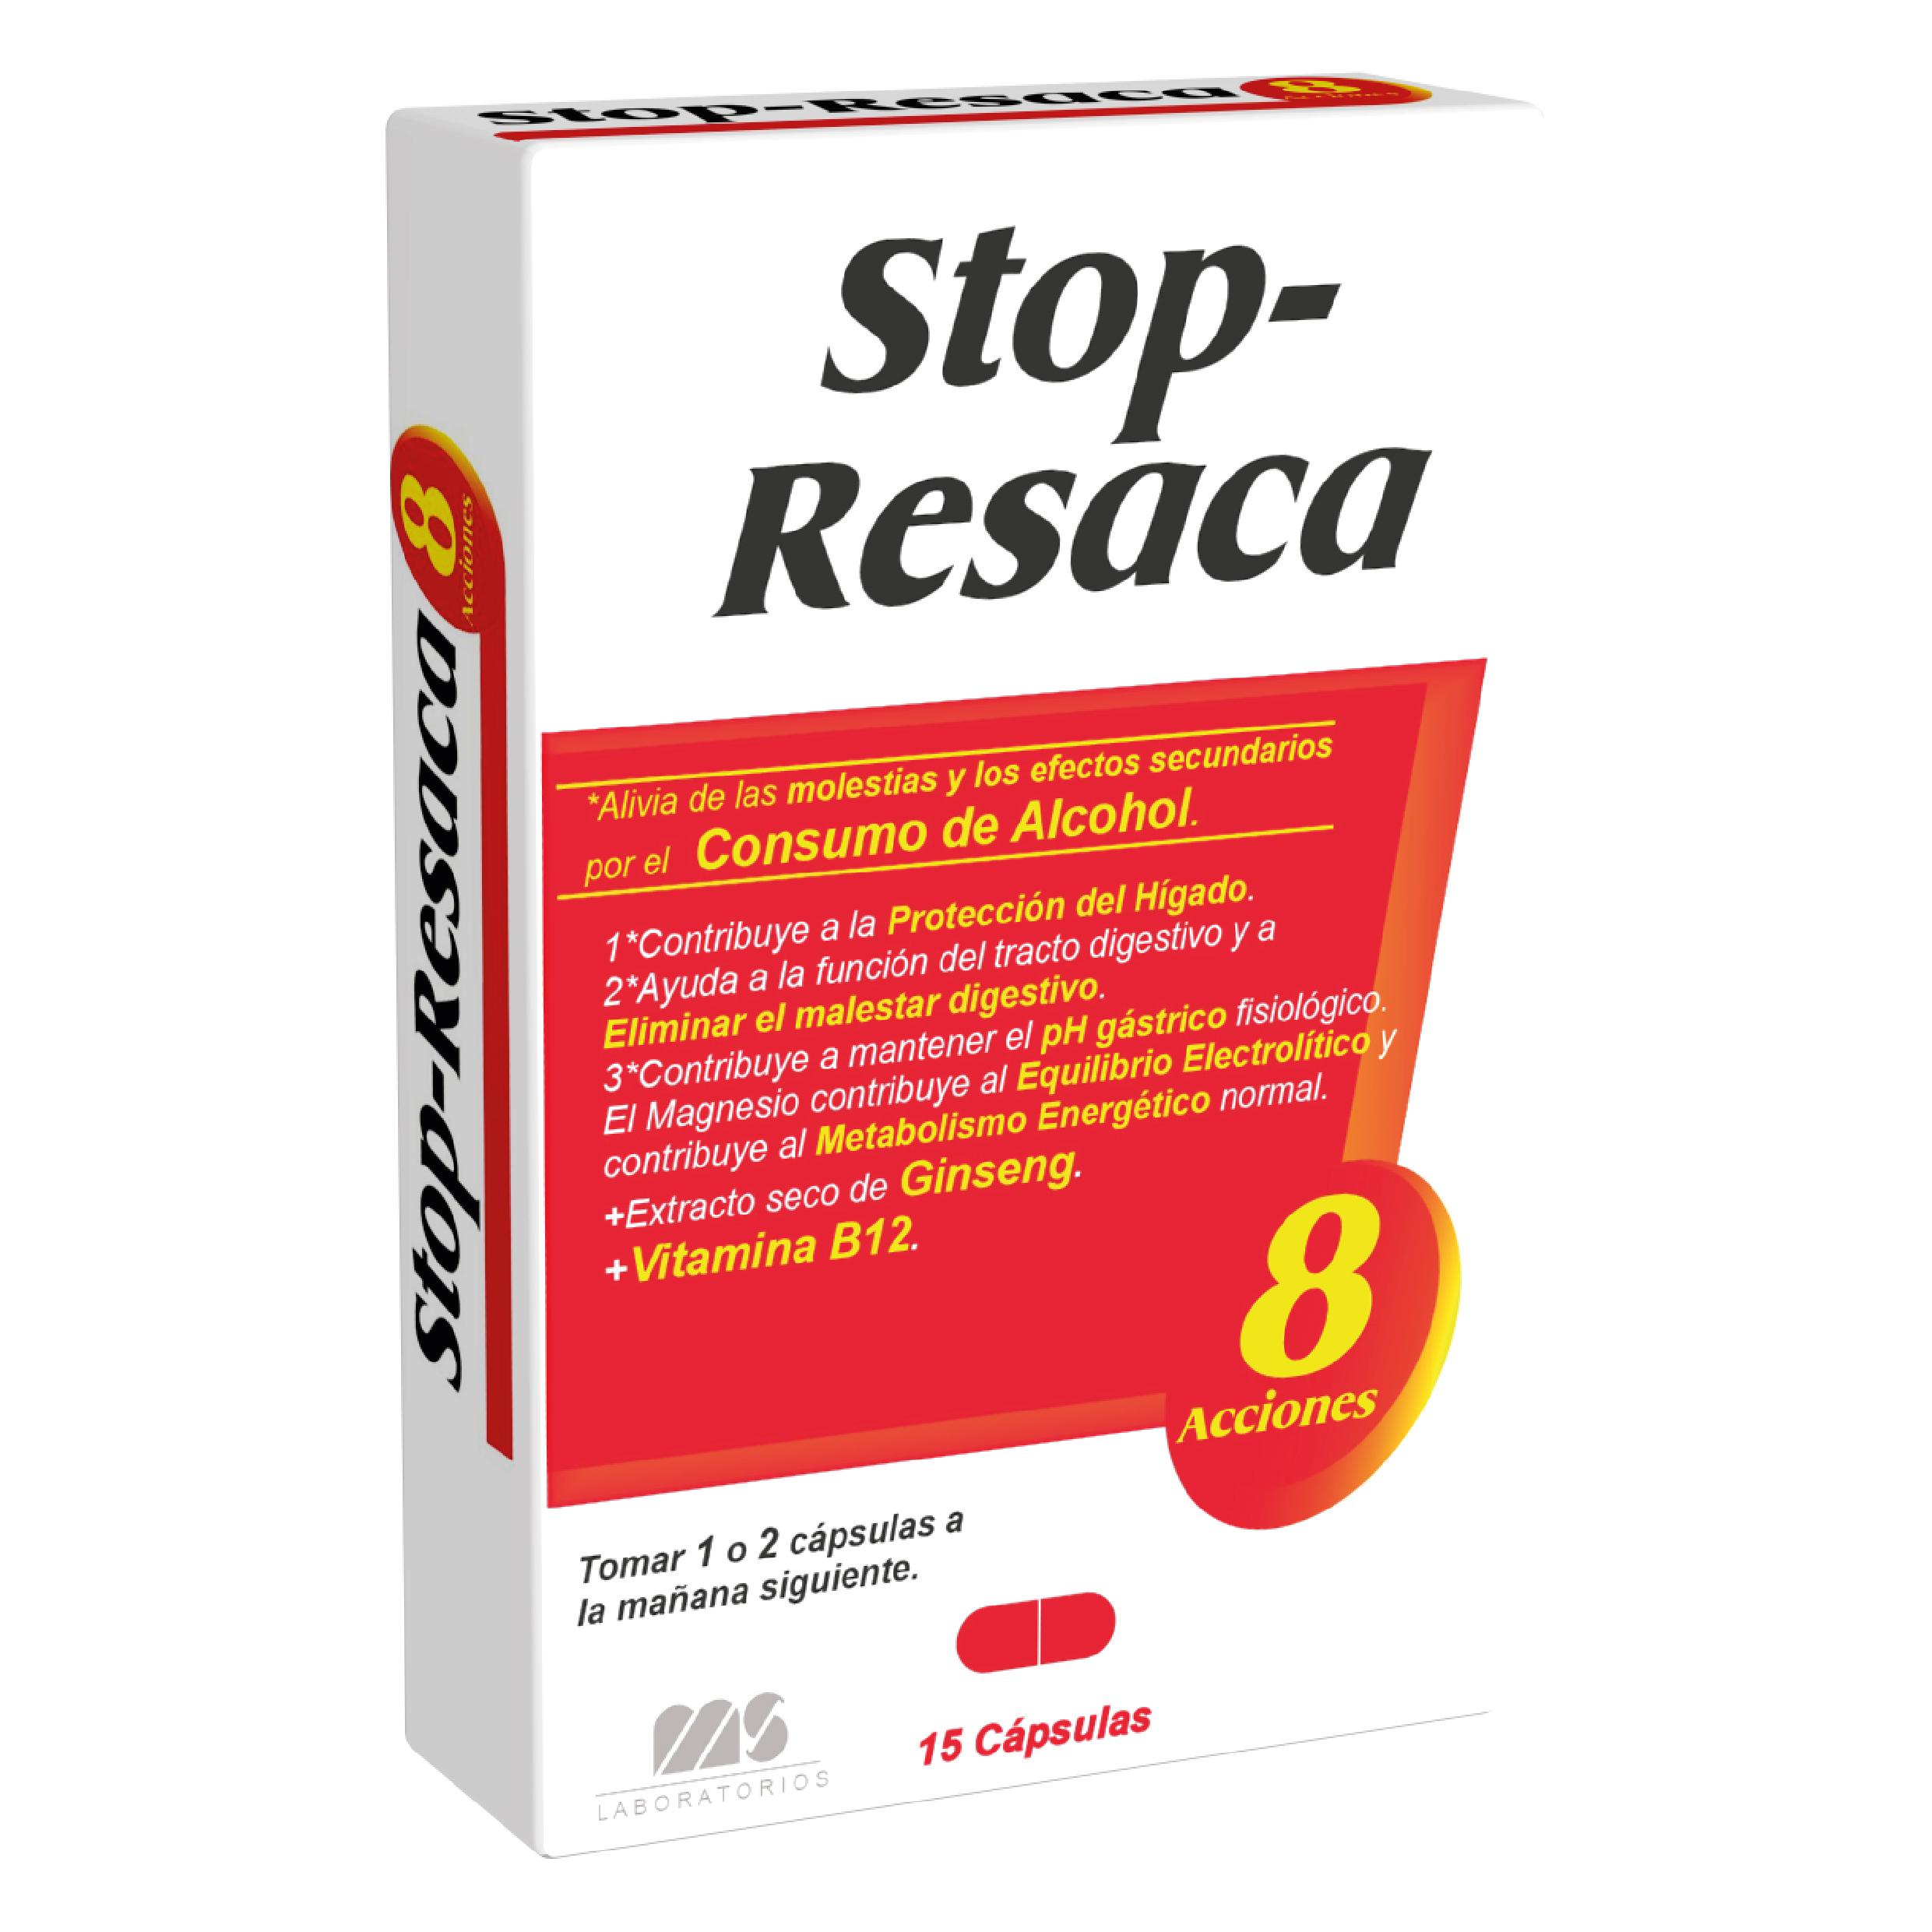 Stop-Resaca